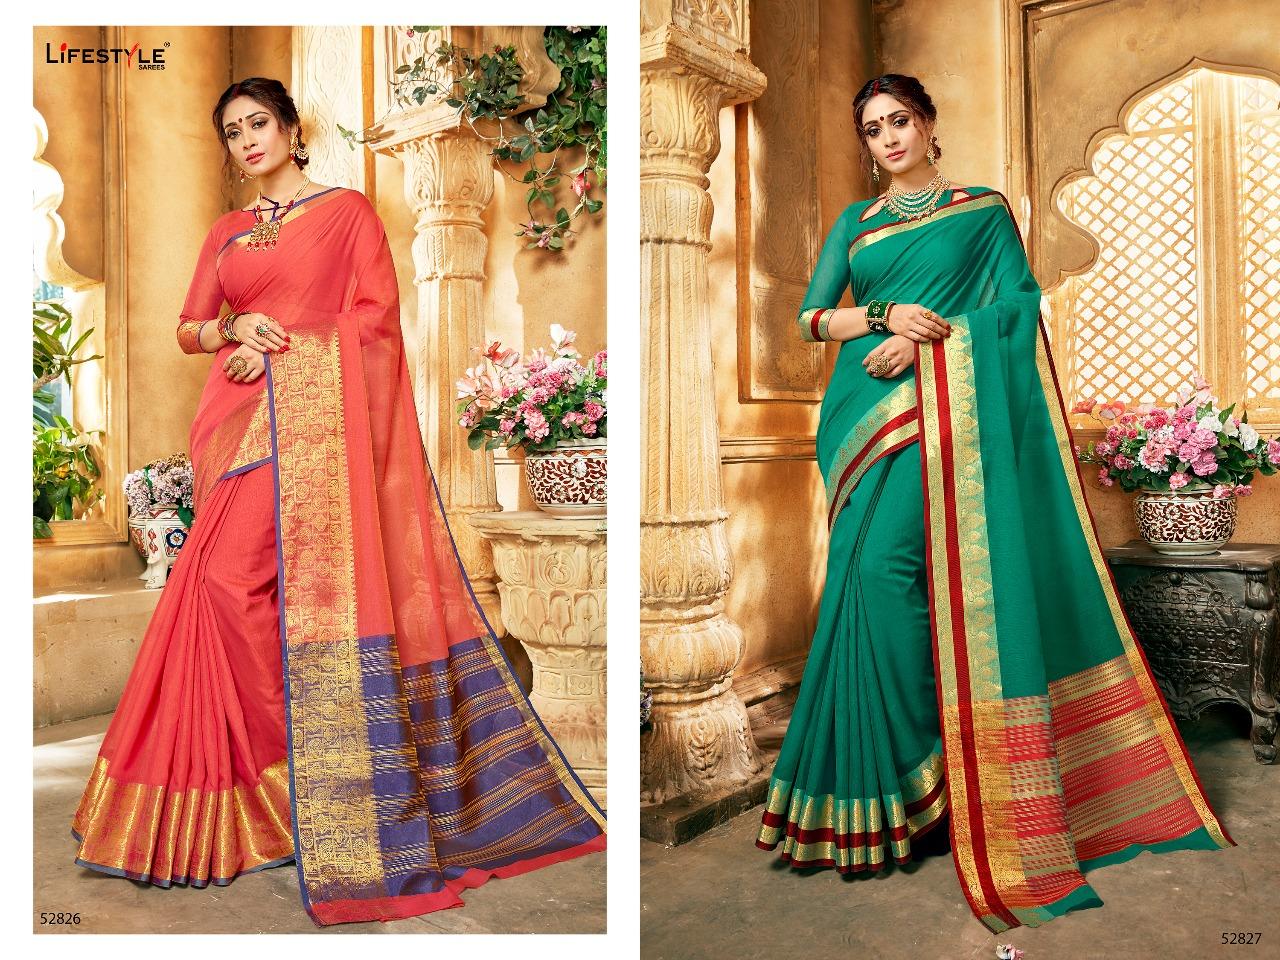 Lifestyle Khadi silk vol 16 52826